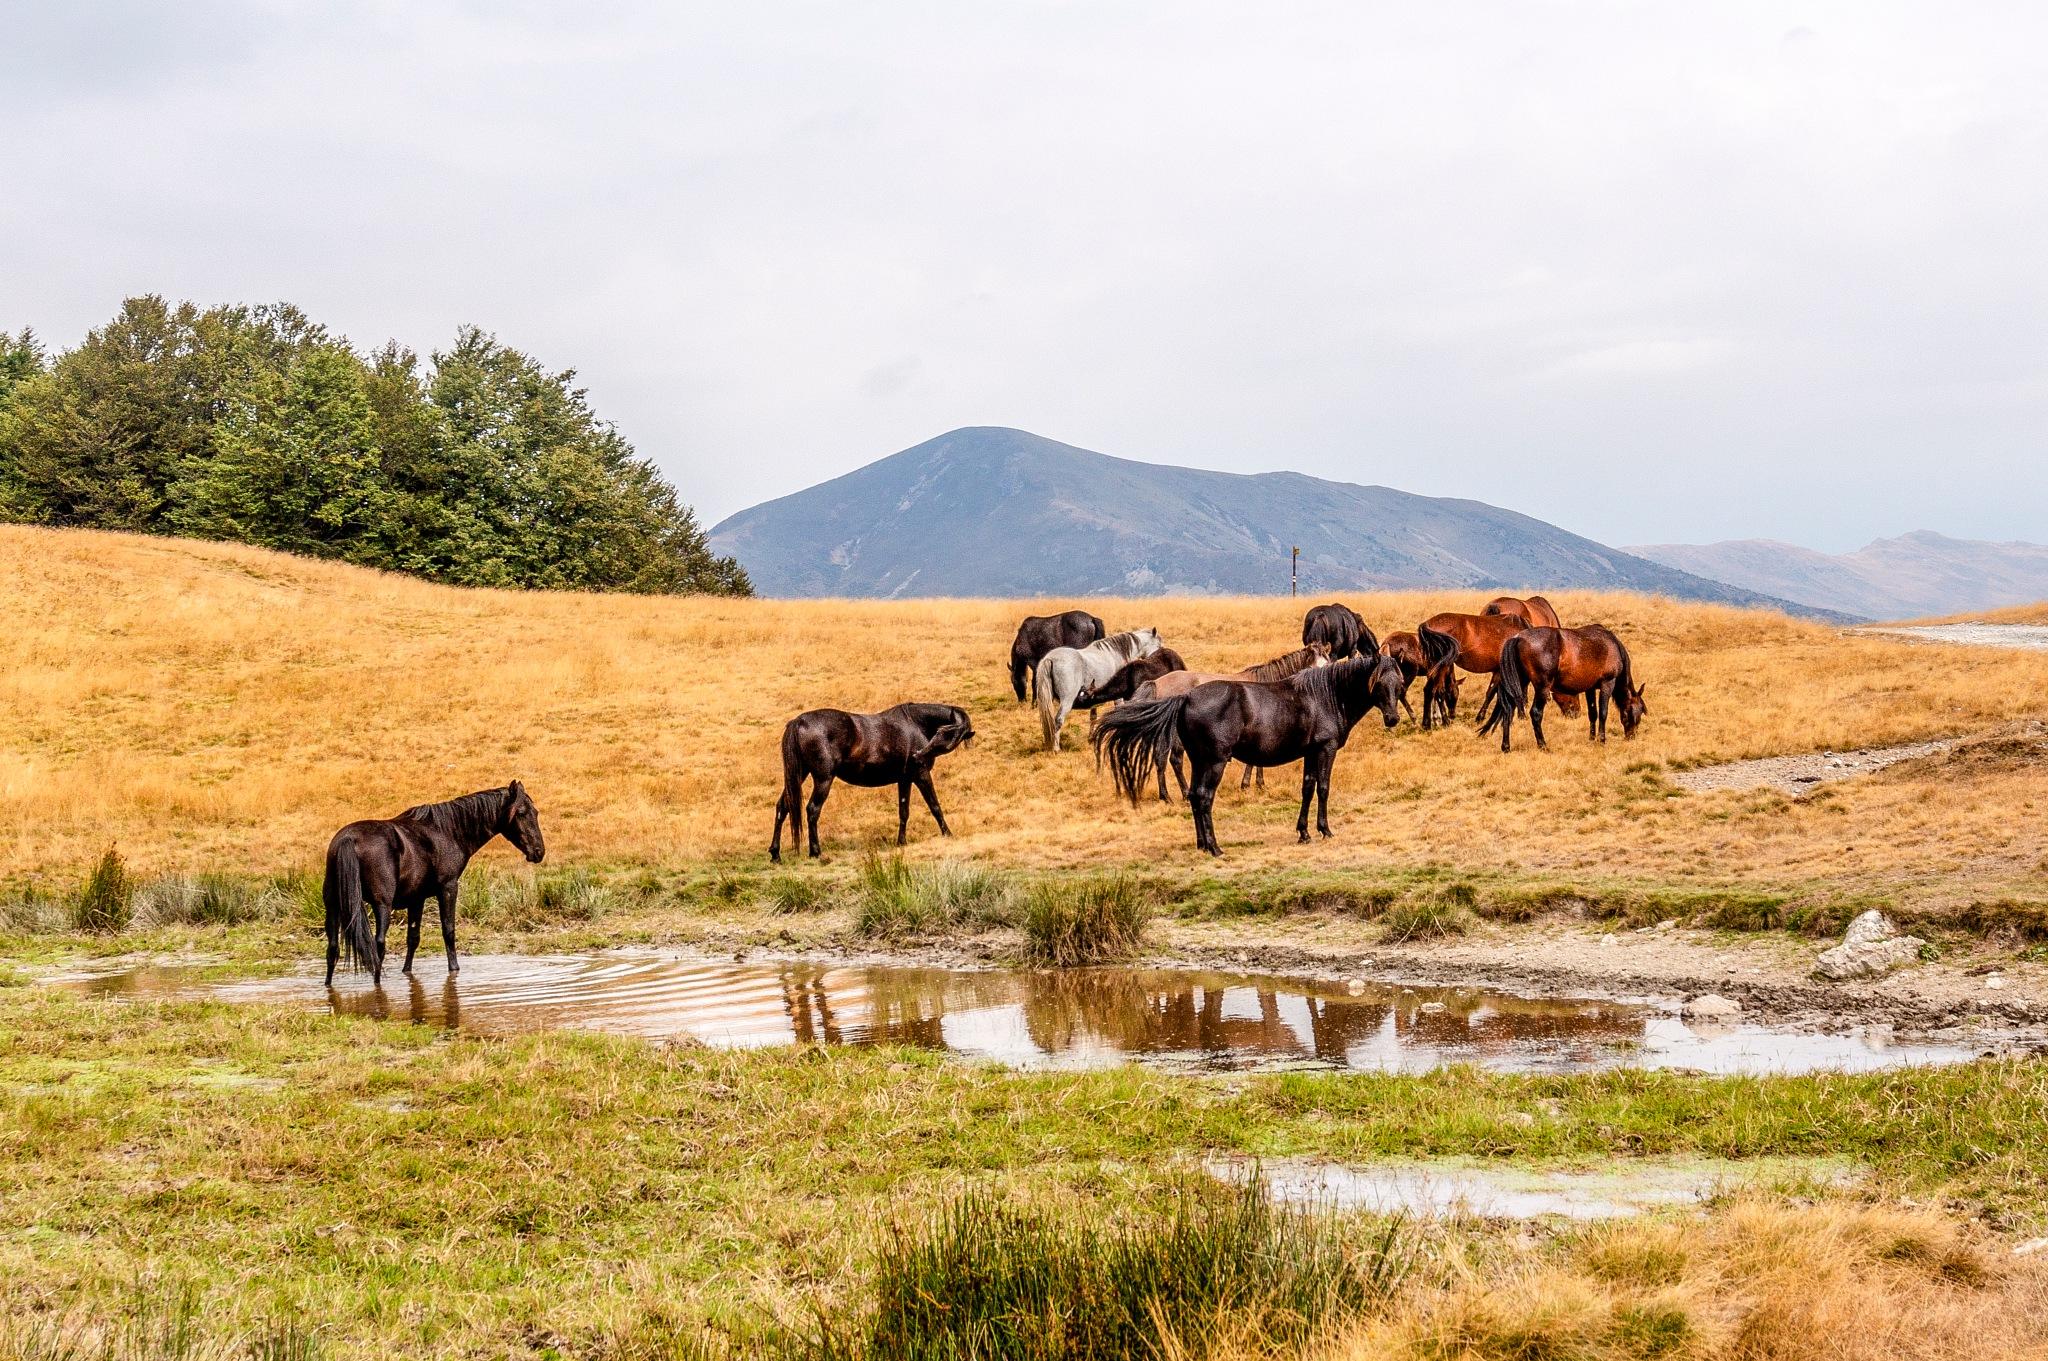 Wild horses on water  by Venelin Todorov